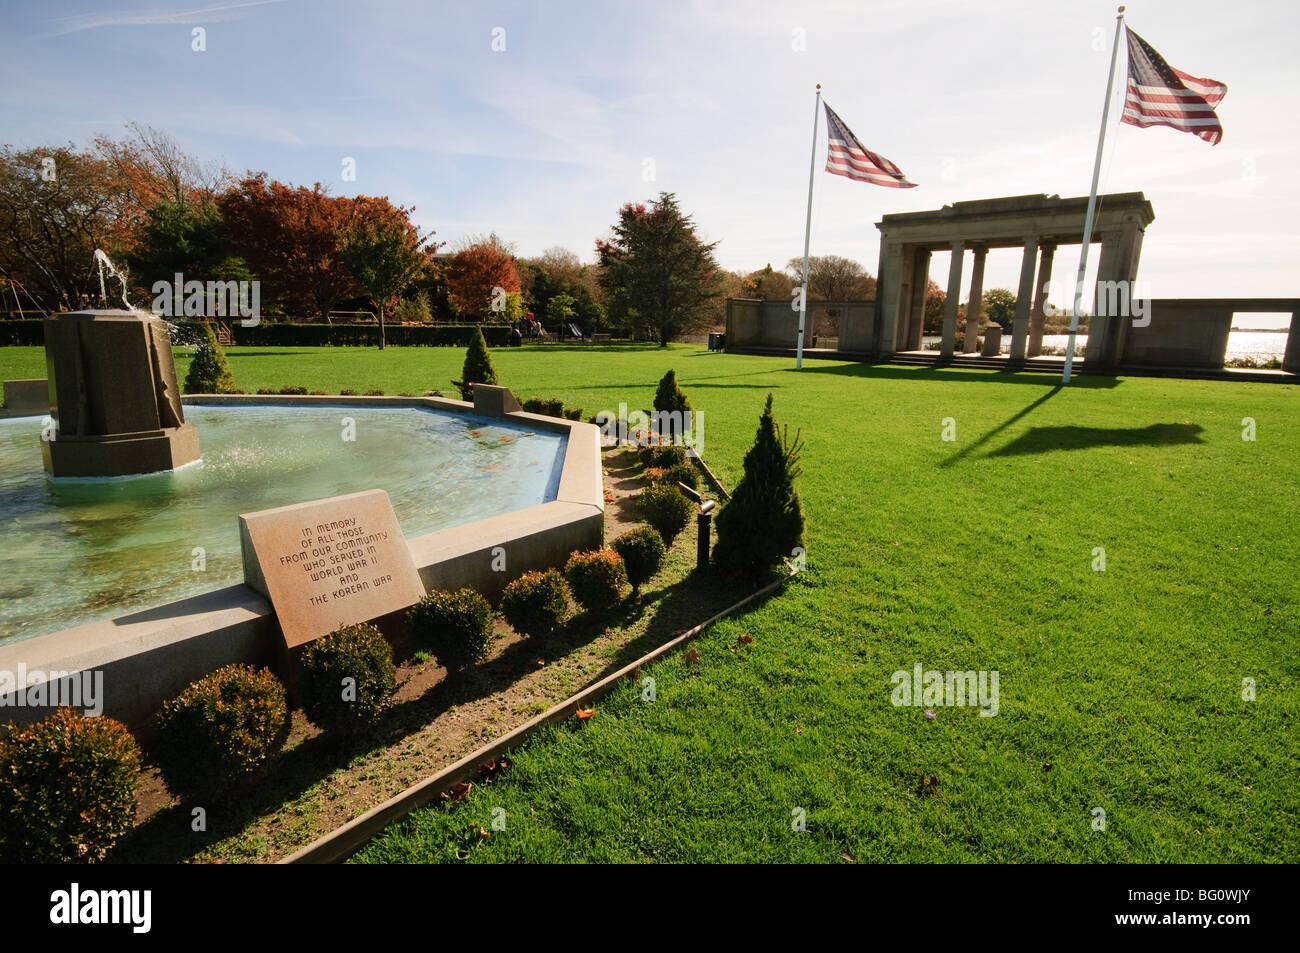 War Memorial, Southampton, the Hamptons, Long Island, New York State, United States of America, North America - Stock Image